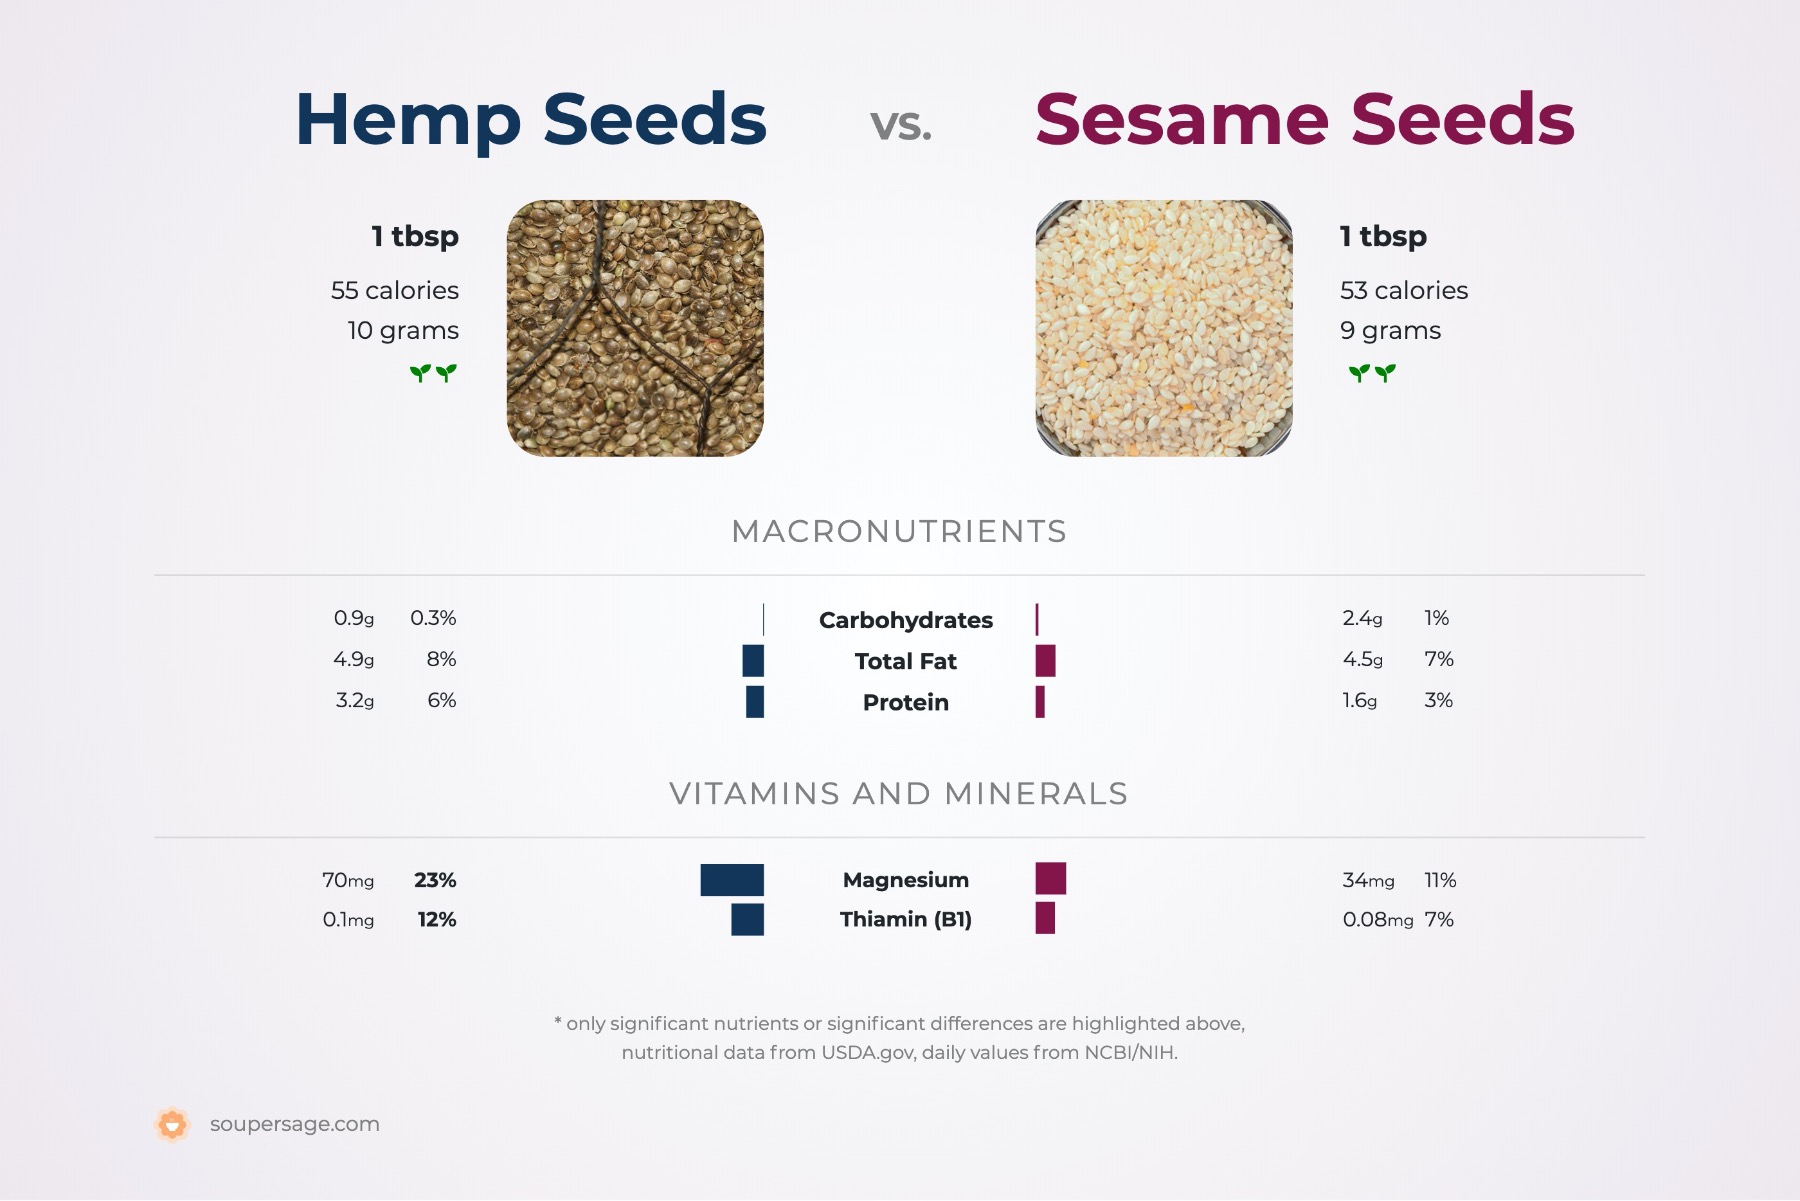 nutrition comparison of hemp seeds vs. sesame seeds